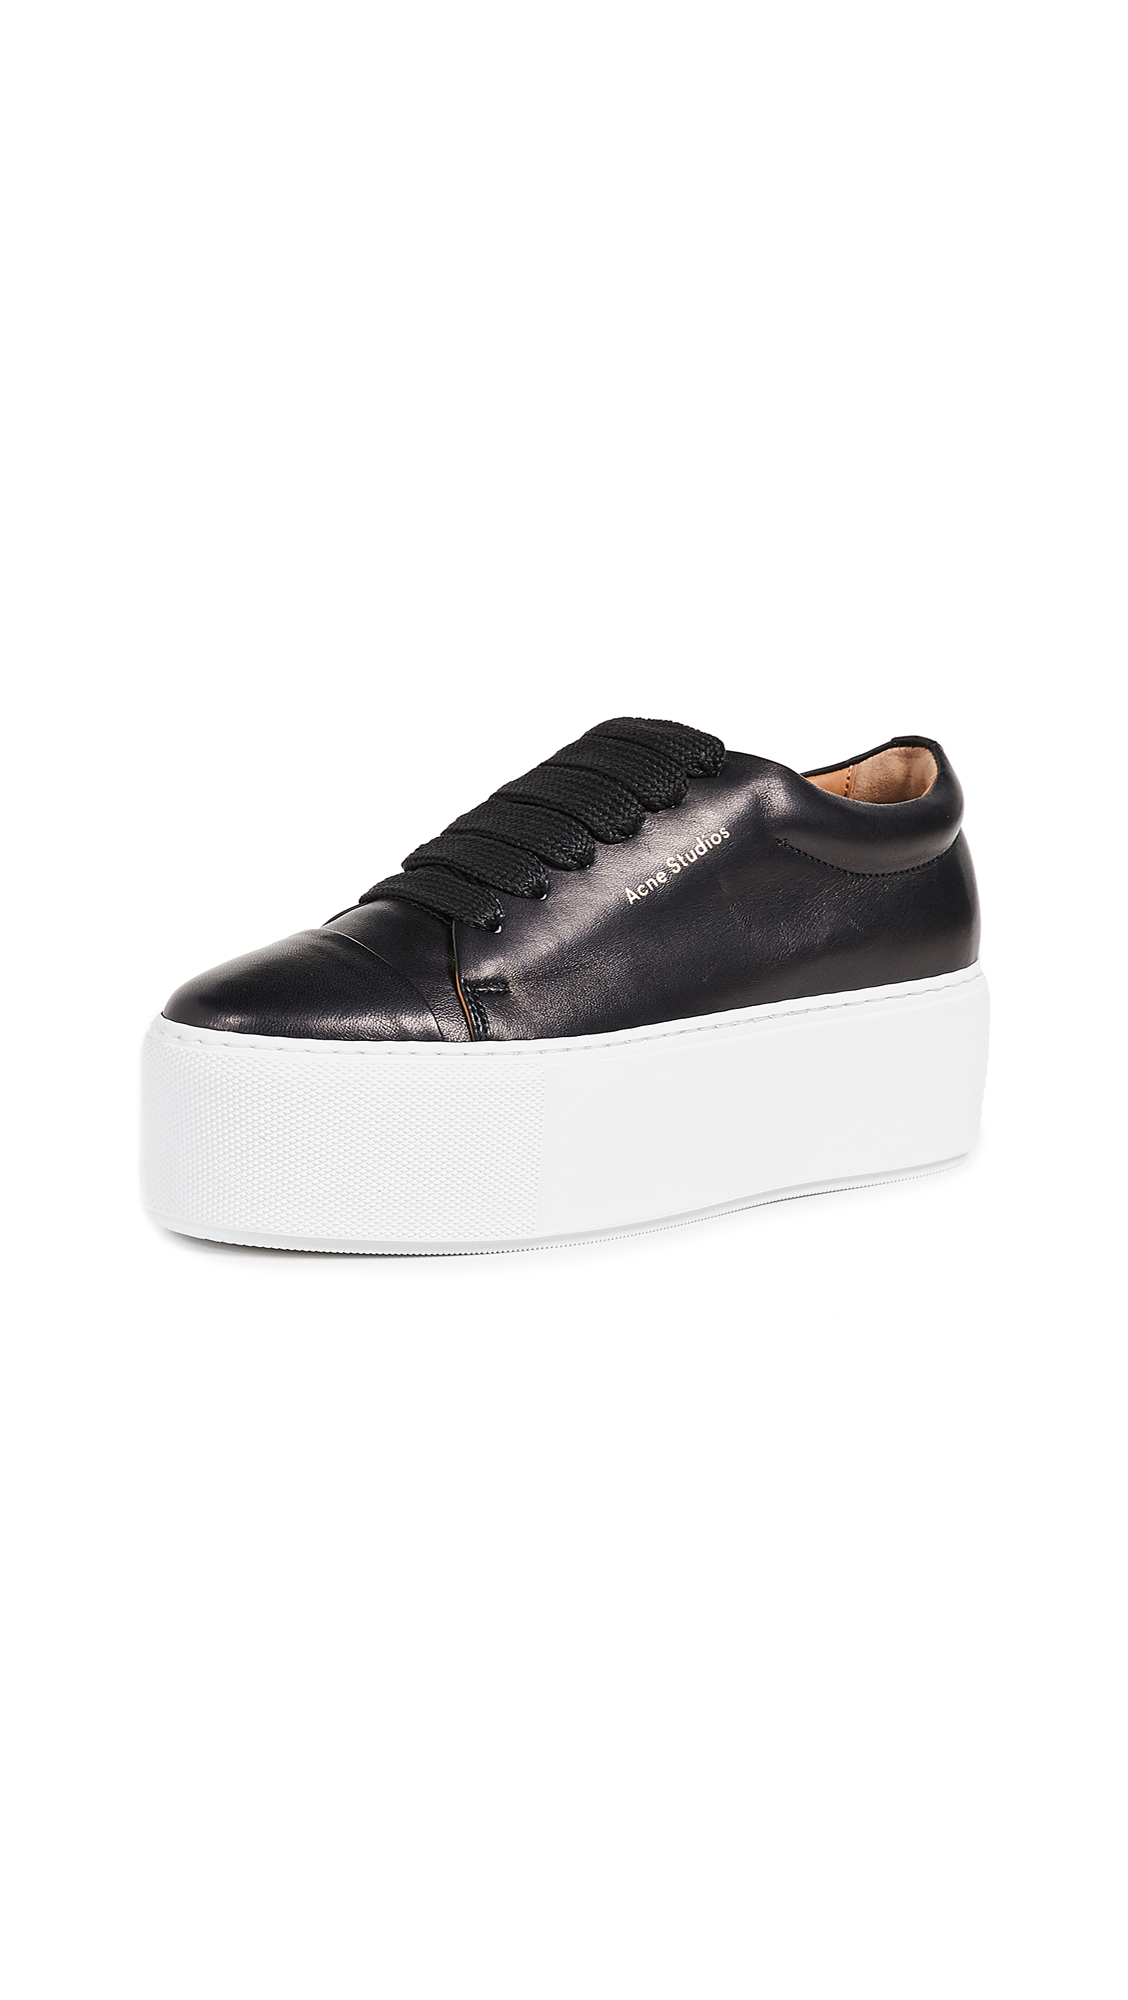 Acne Studios Drihanna Logo Sneakers - Black/White